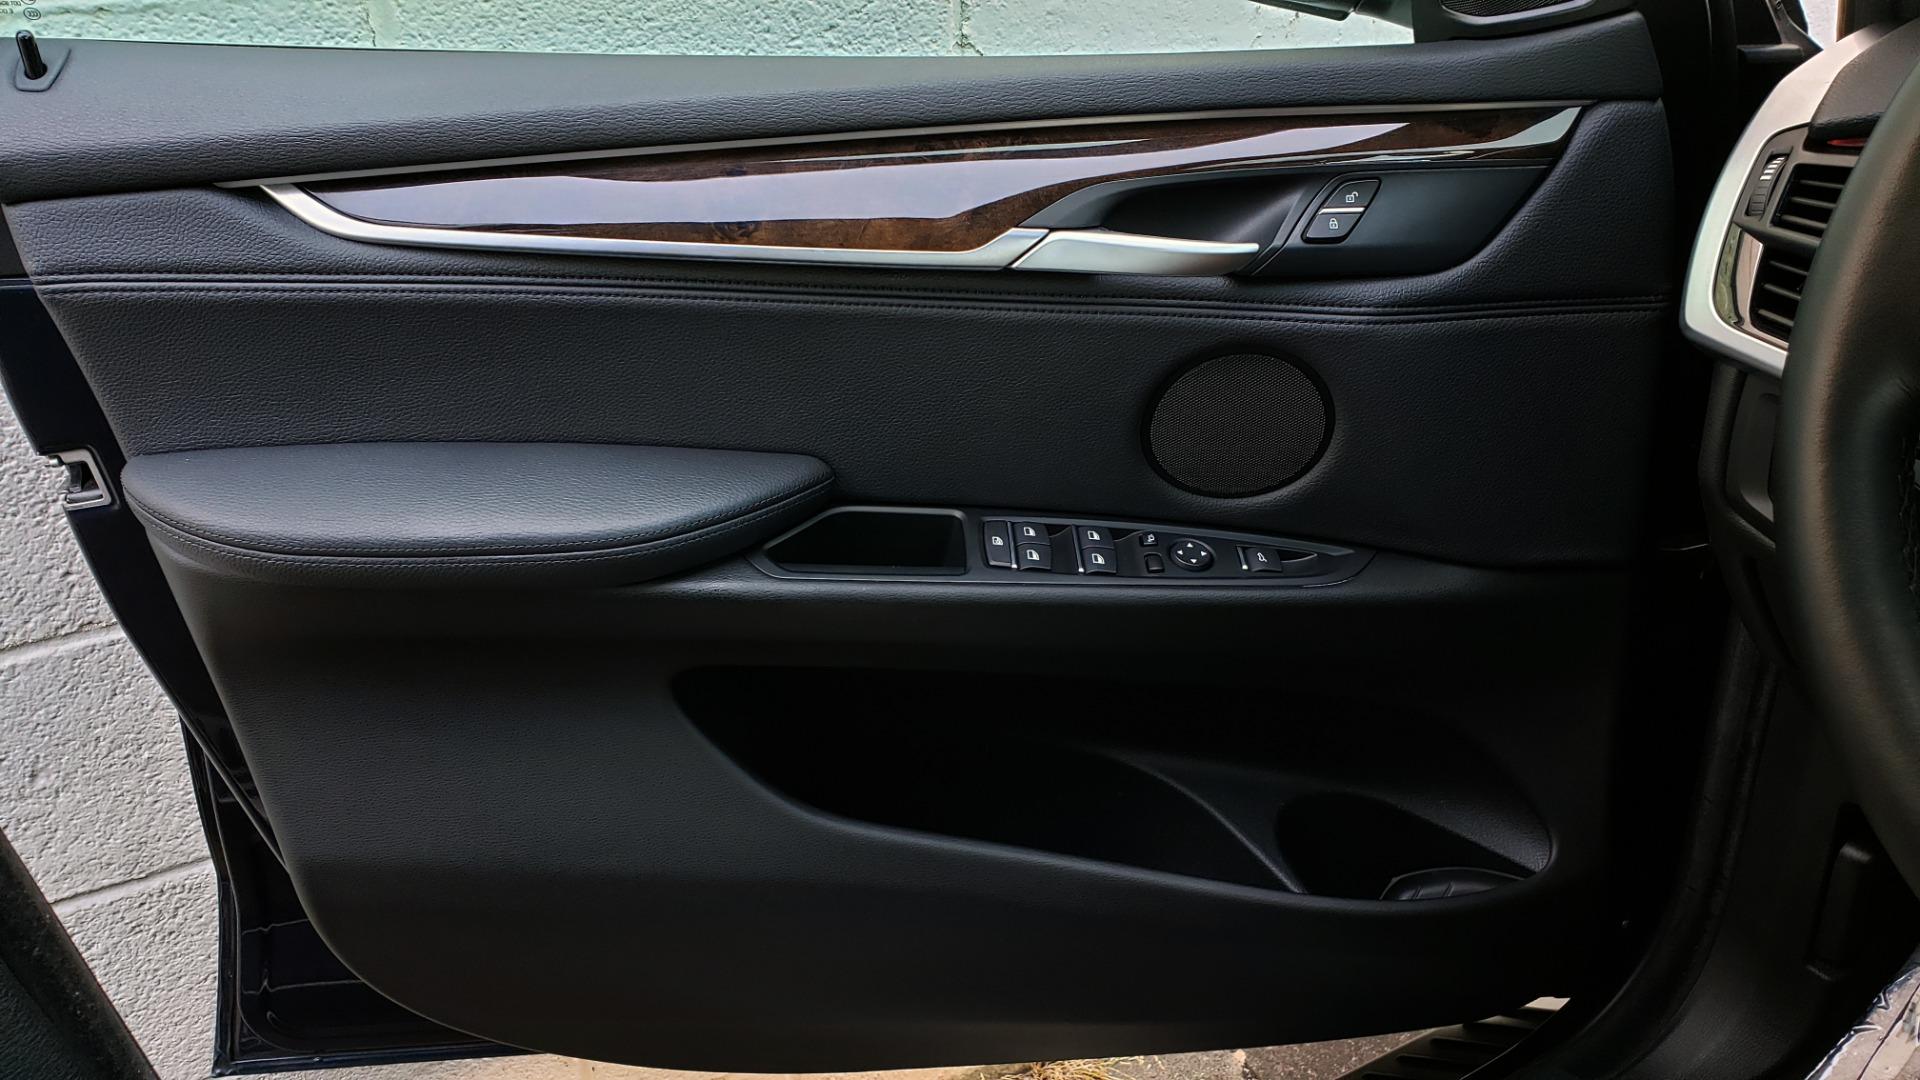 Used 2016 BMW X5 XDRIVE35I / PREM PKG / NAV / DRVR ASST PLUS / REARVIEW for sale $25,765 at Formula Imports in Charlotte NC 28227 25